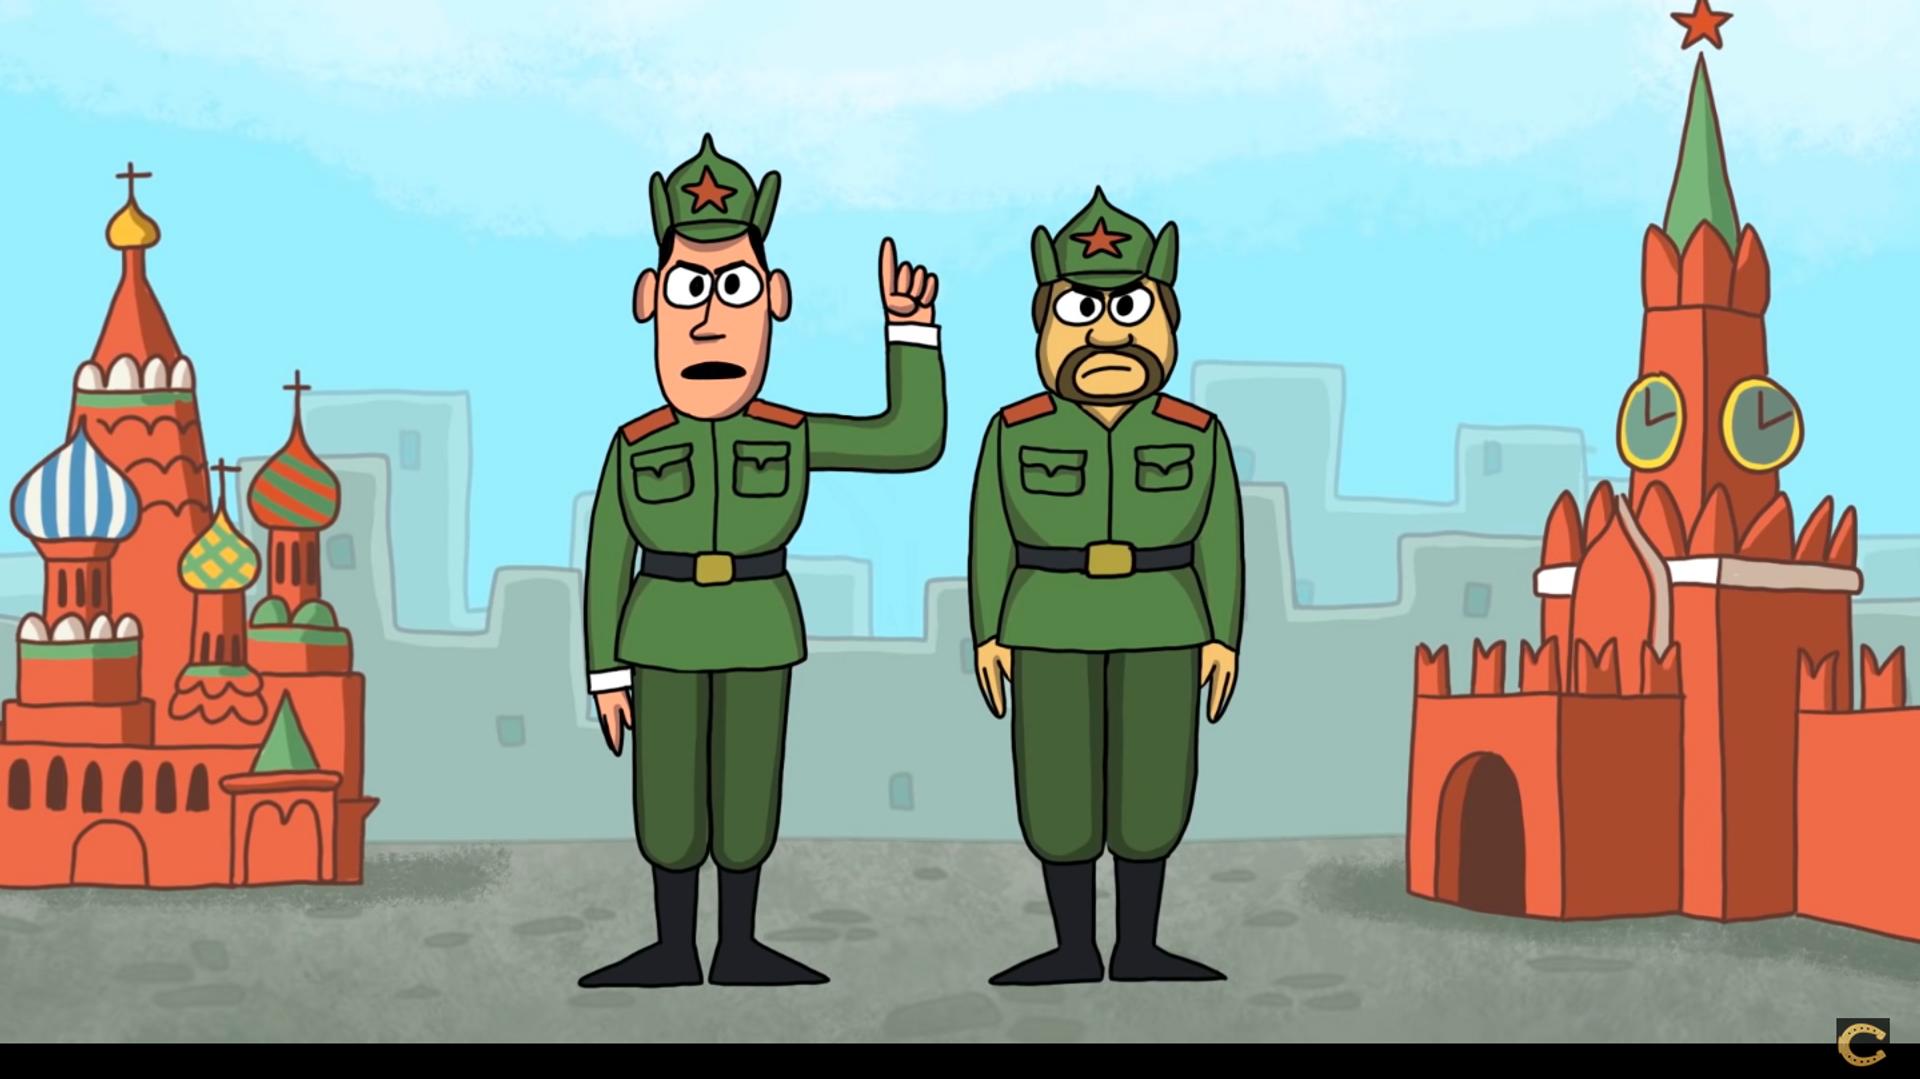 Animovaný film o dobrodružstvích Petrova a Boširova - Sputnik Česká republika, 1920, 01.06.2021